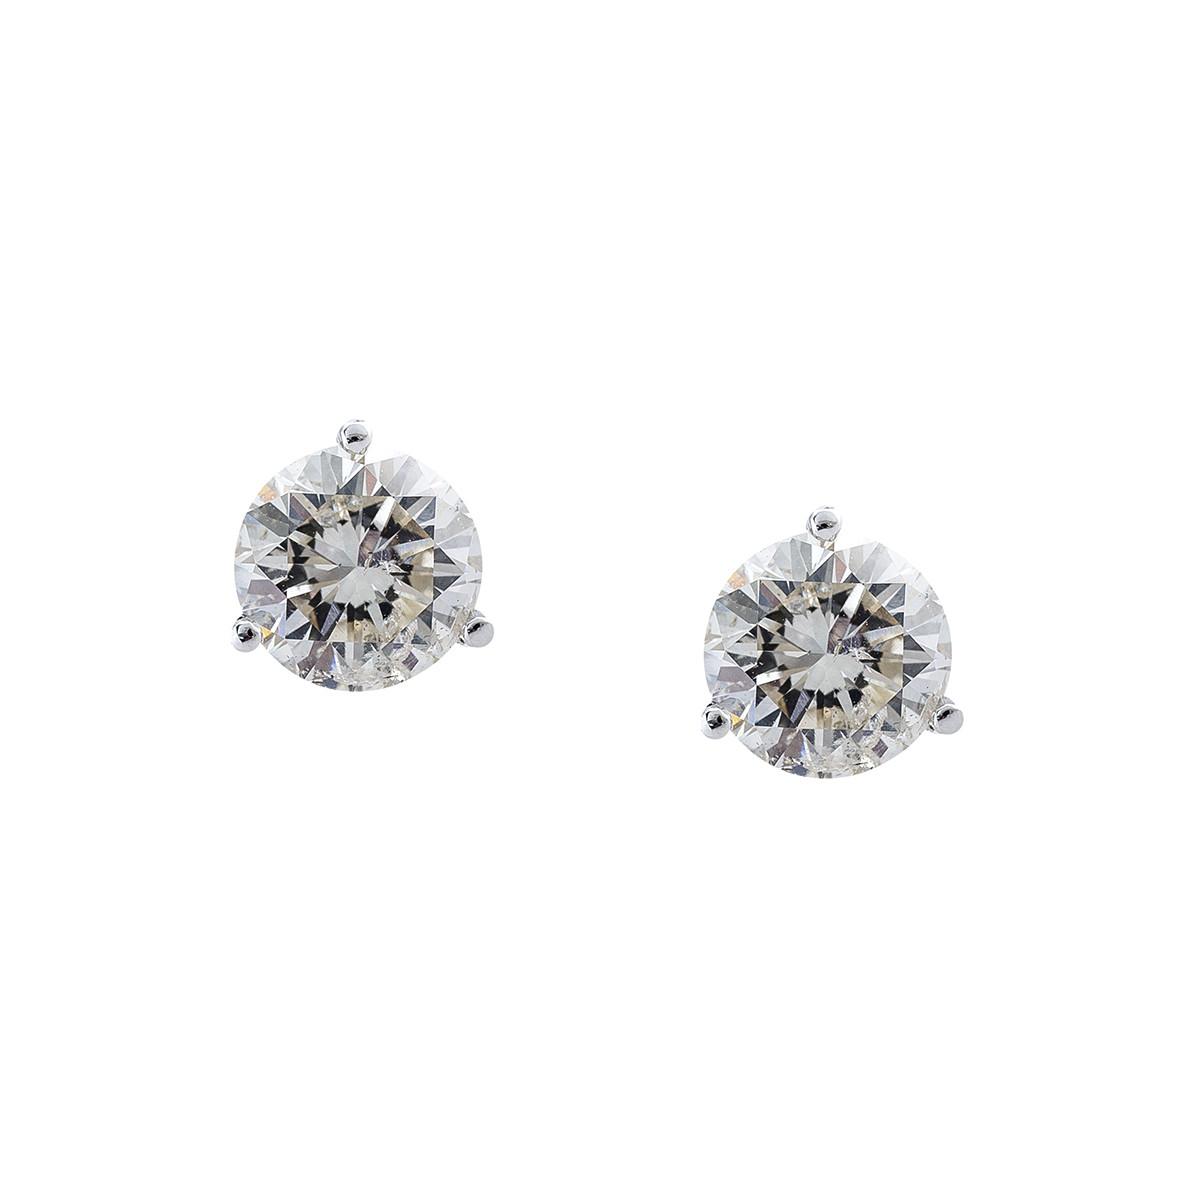 New 2.35 CTW Diamond Stud Earrings